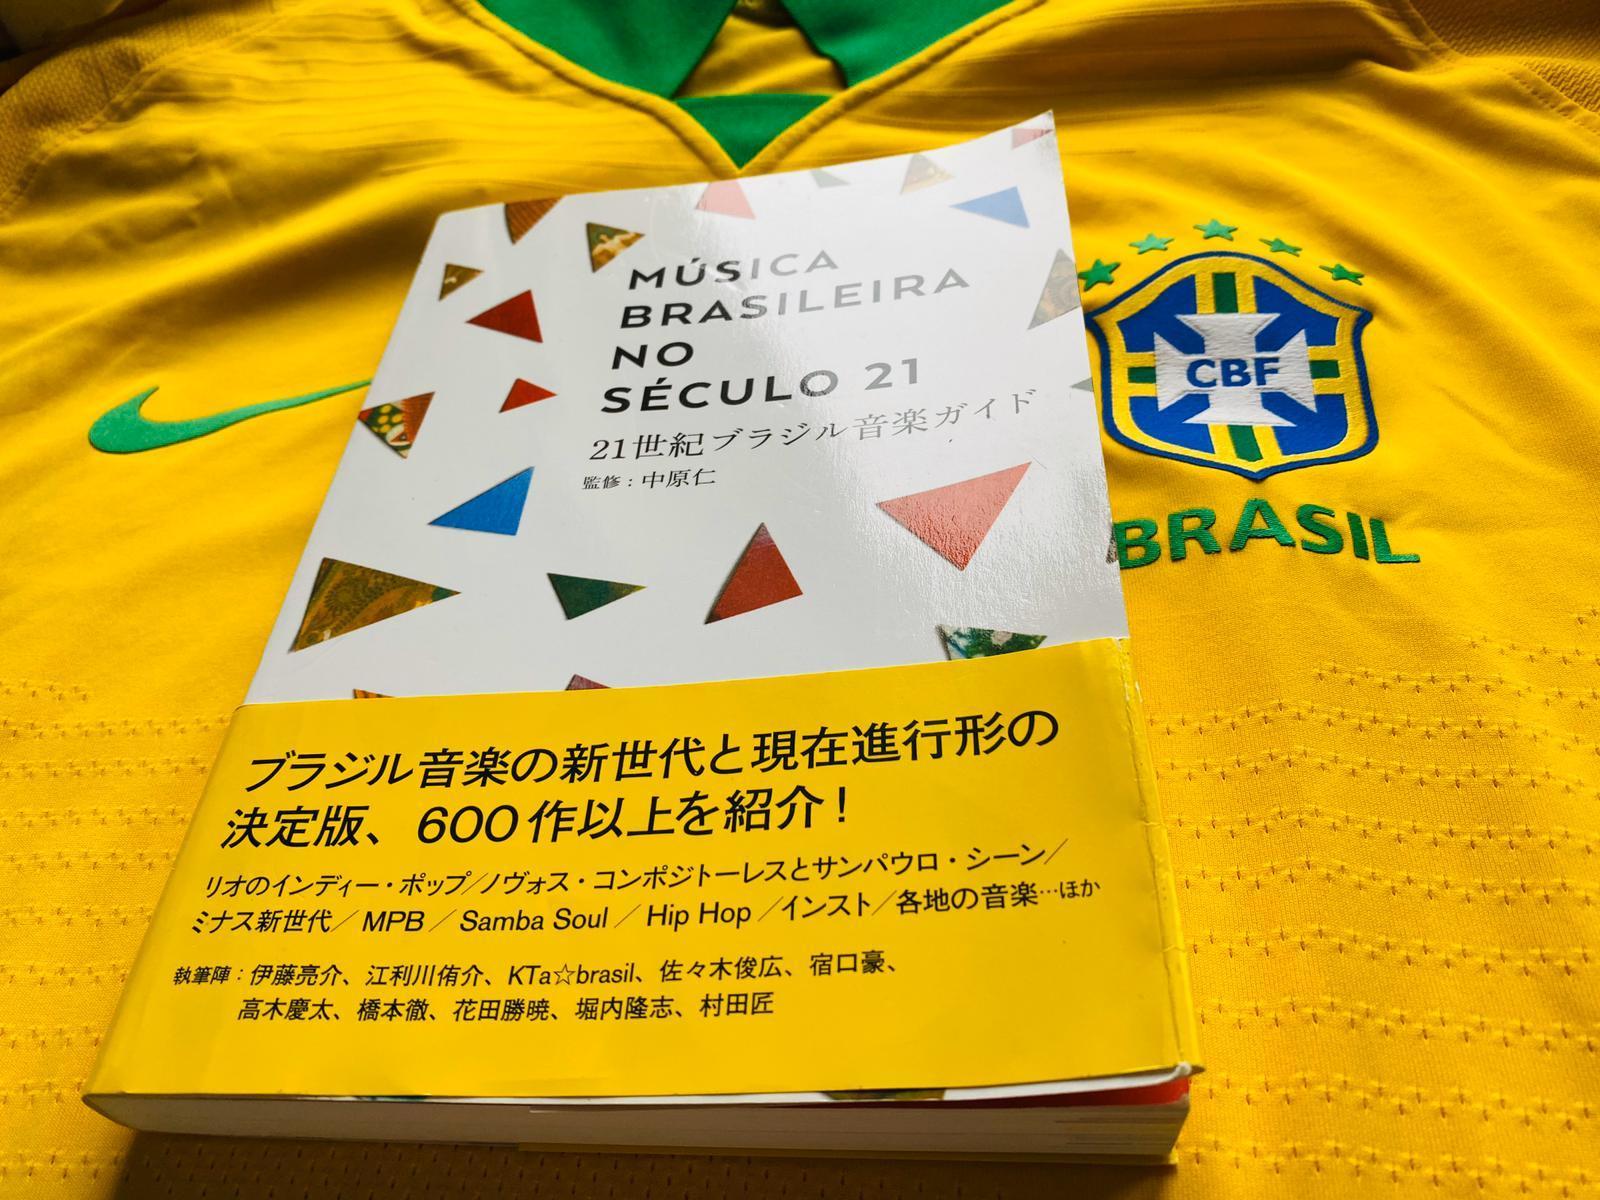 from São Paulo♥あの #KALEIDOSCOPIO のVocal #JanainaLima が語る #KeitaBrasil とは? #QuemEhKeitaBrasil ? #ブラジル_b0032617_13455137.jpg